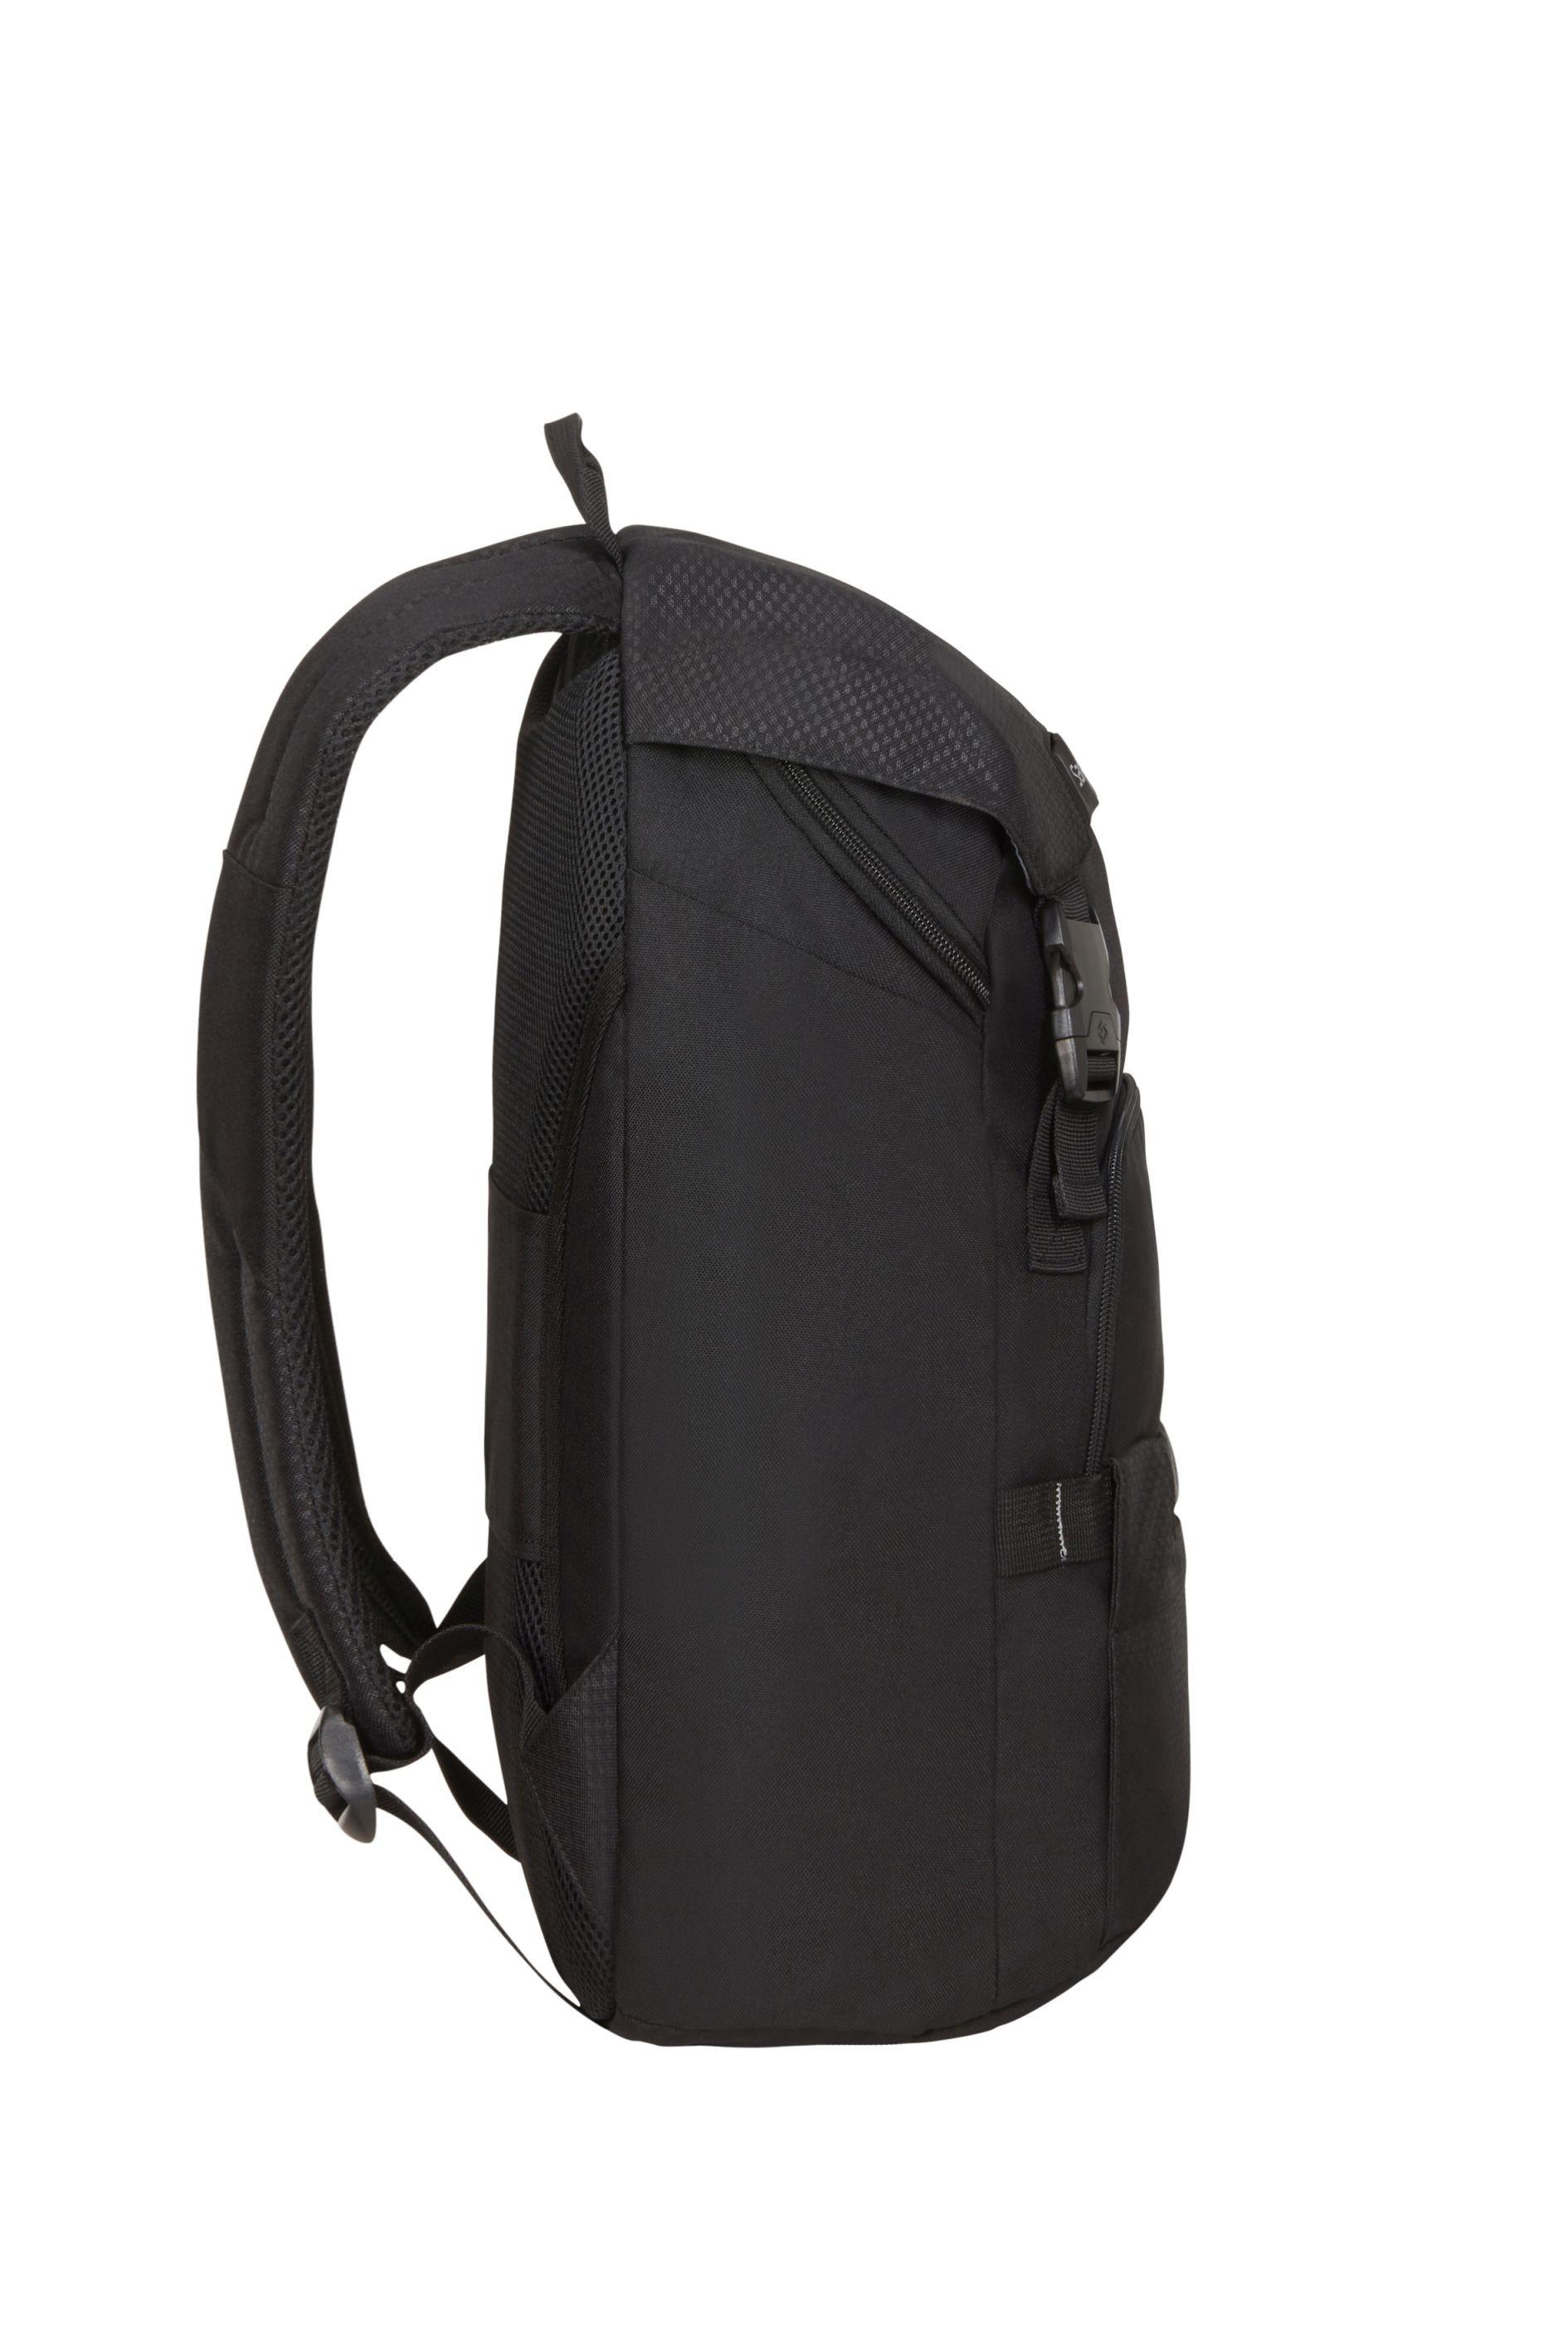 Samsonite Sonora Laptop Backpack M, View 6